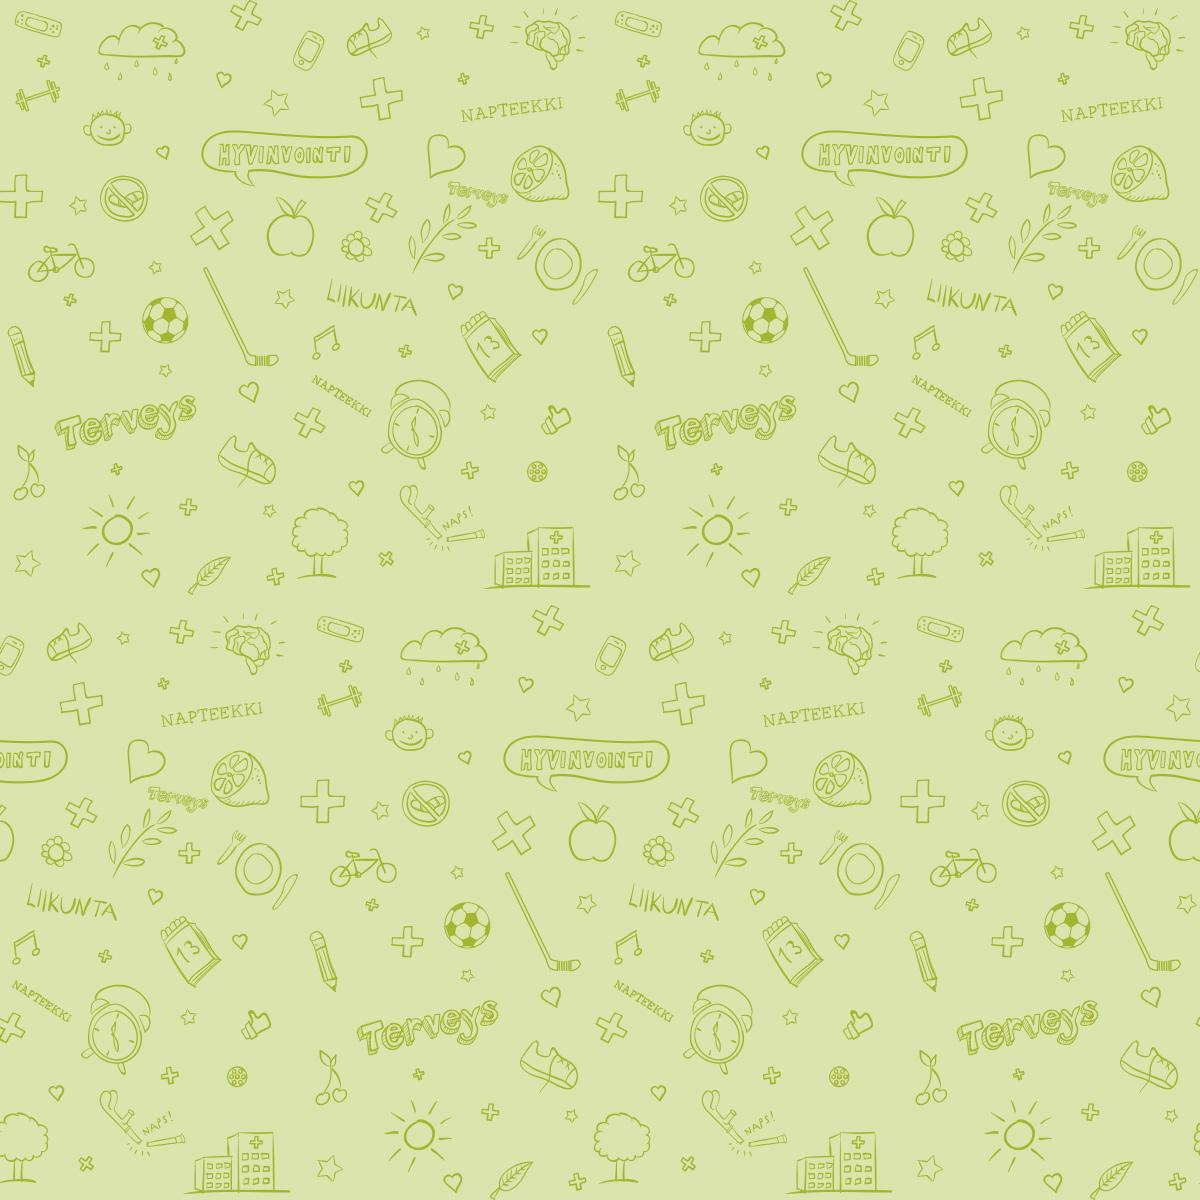 background_pattern_1200px